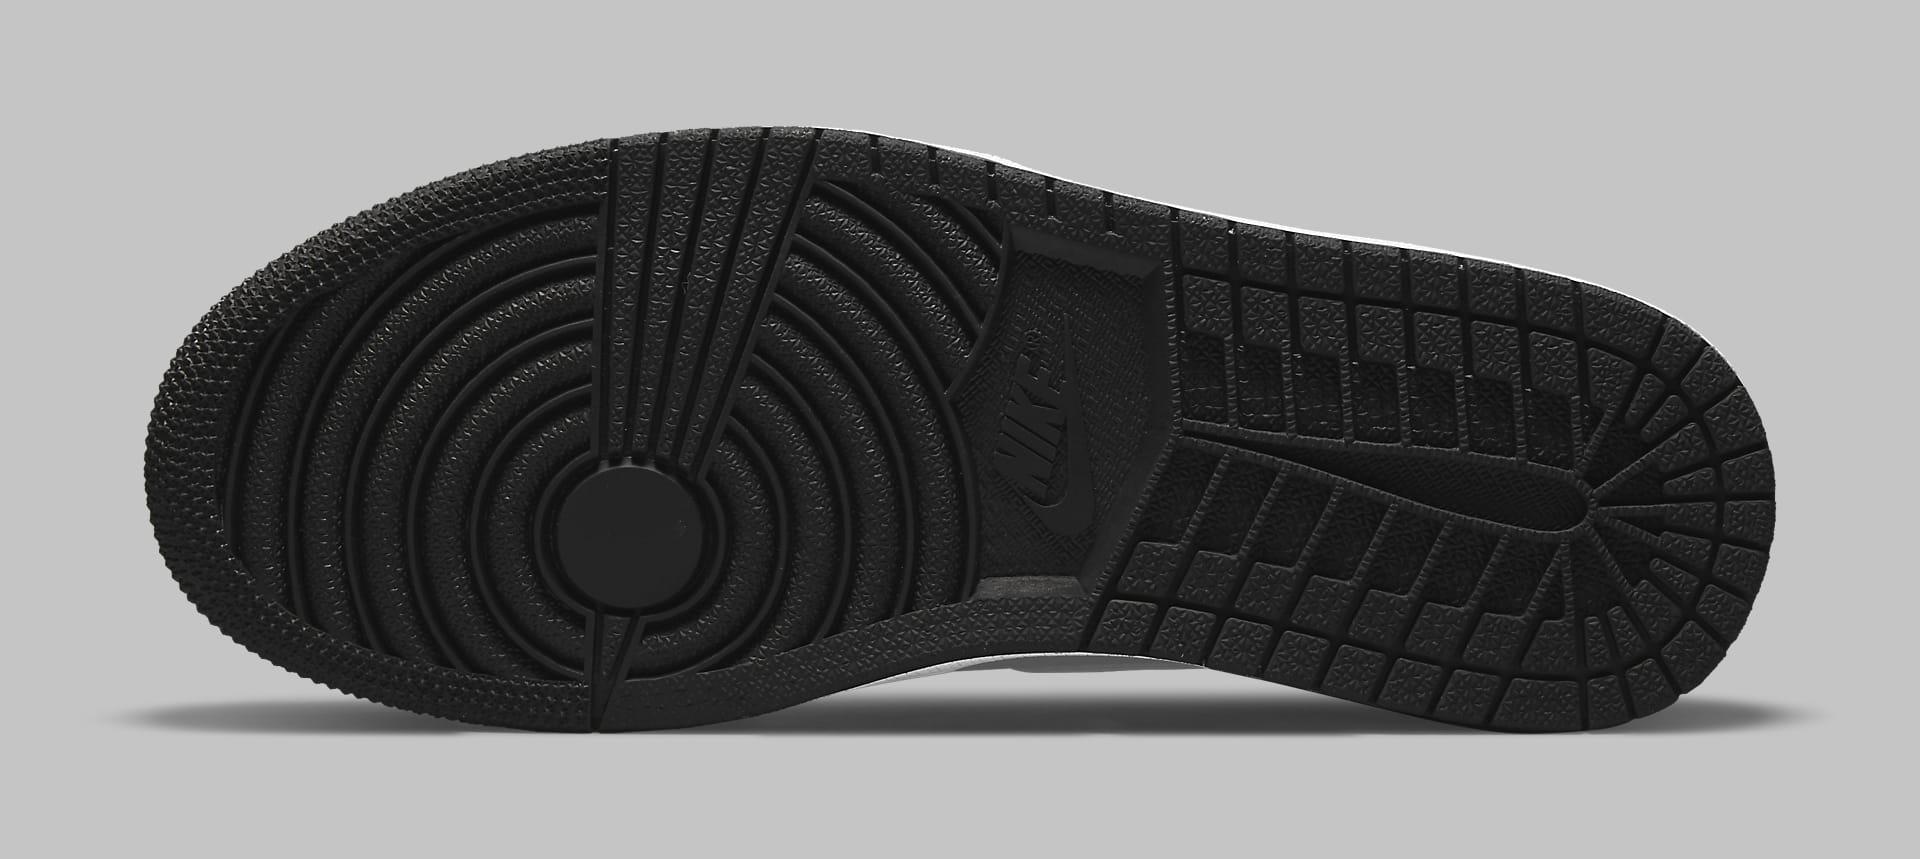 Air Jordan 1 Retro High OG 'Shadow 2.0' 555088-035 Outsole